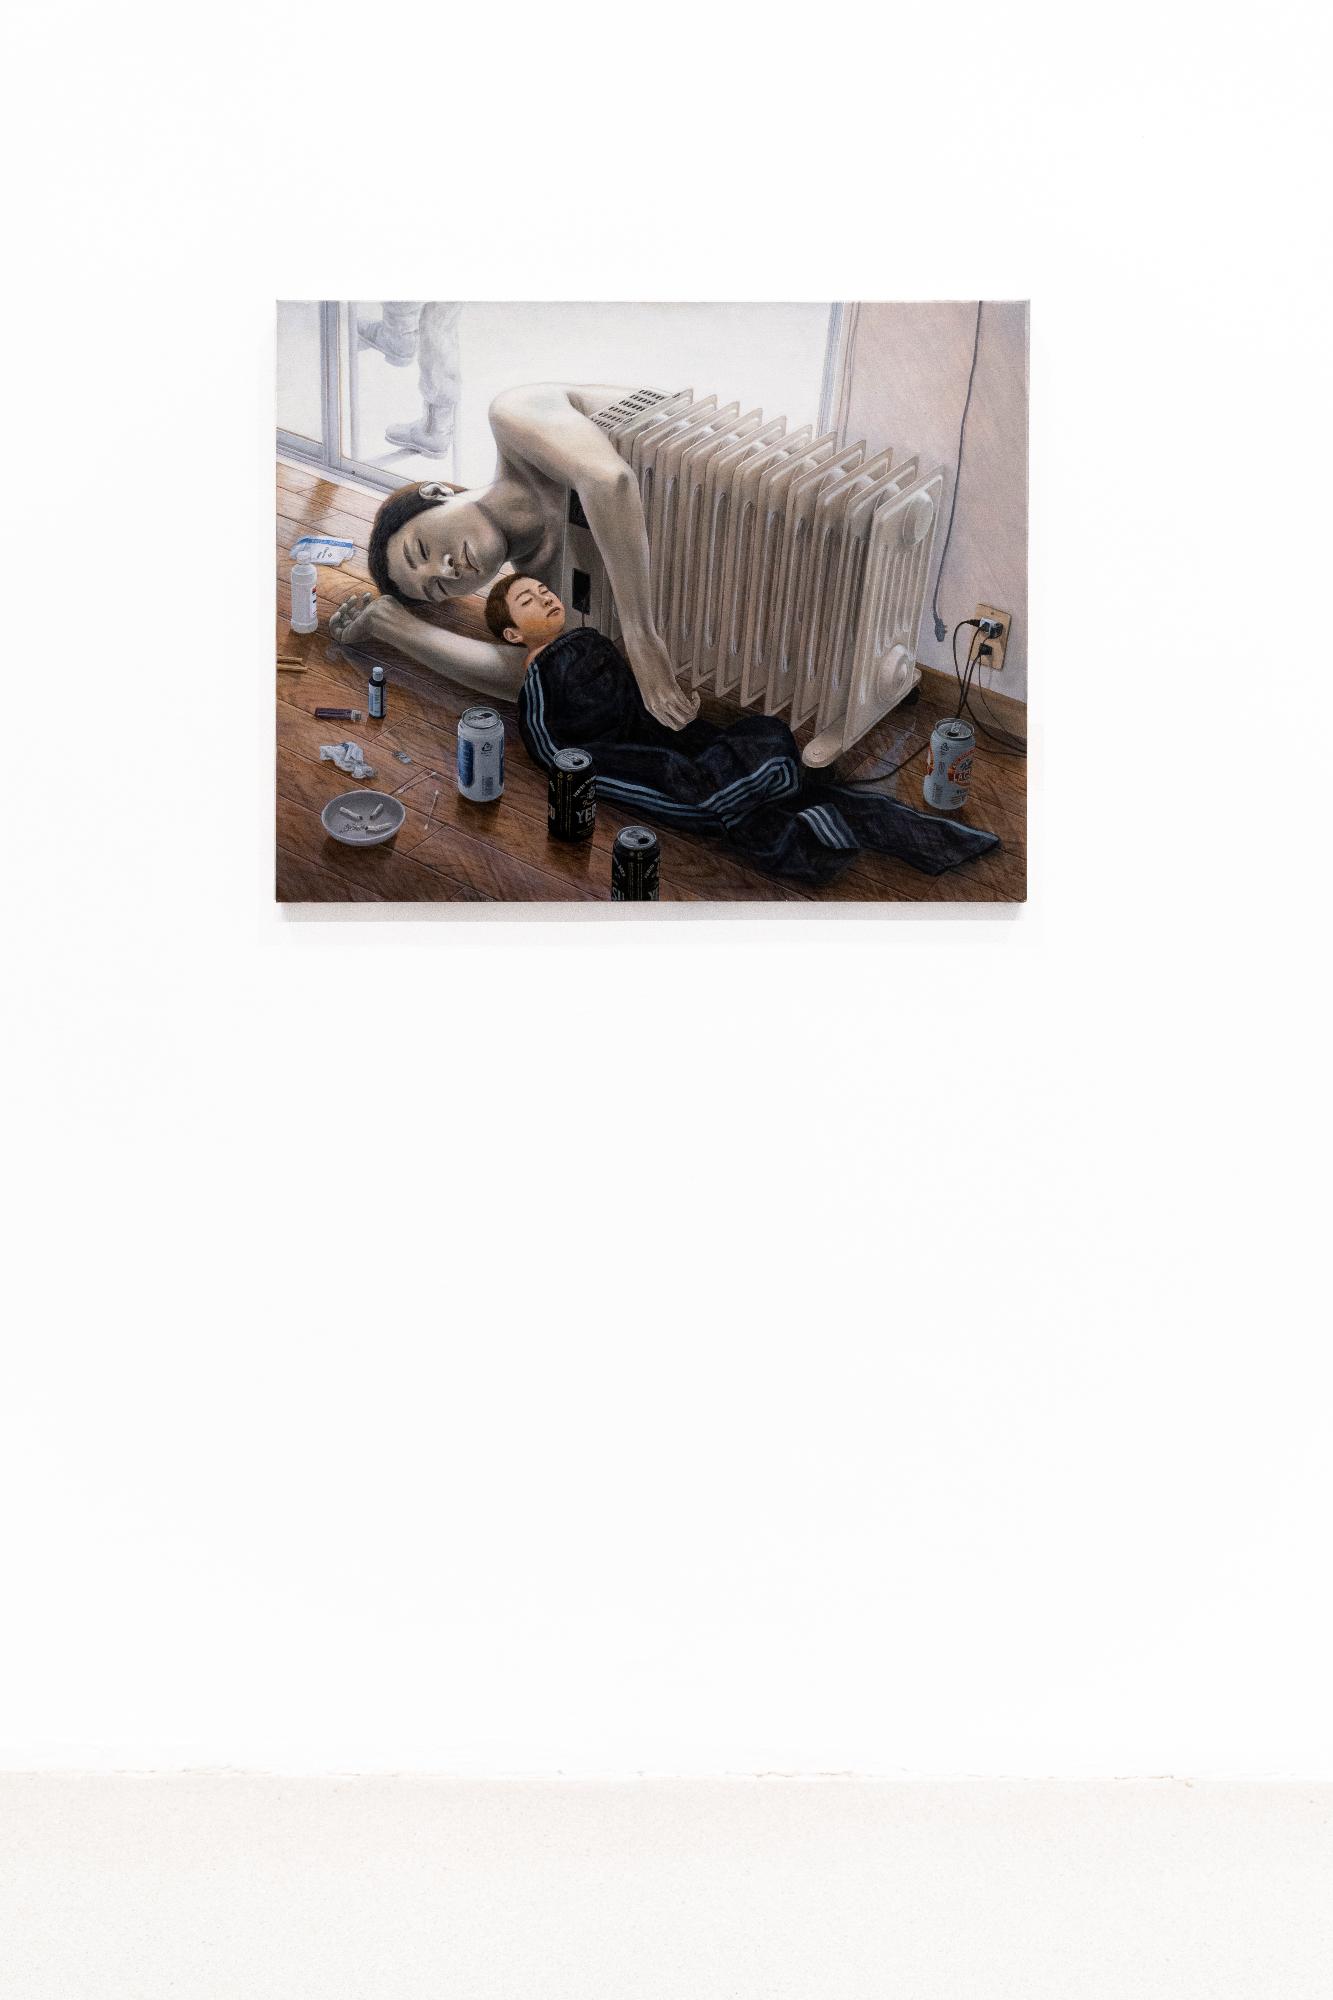 CaballeroCosmica-ExhibitionPhoto-Tetsuya-Ishida-palaciovelazquez-27-p.jpg